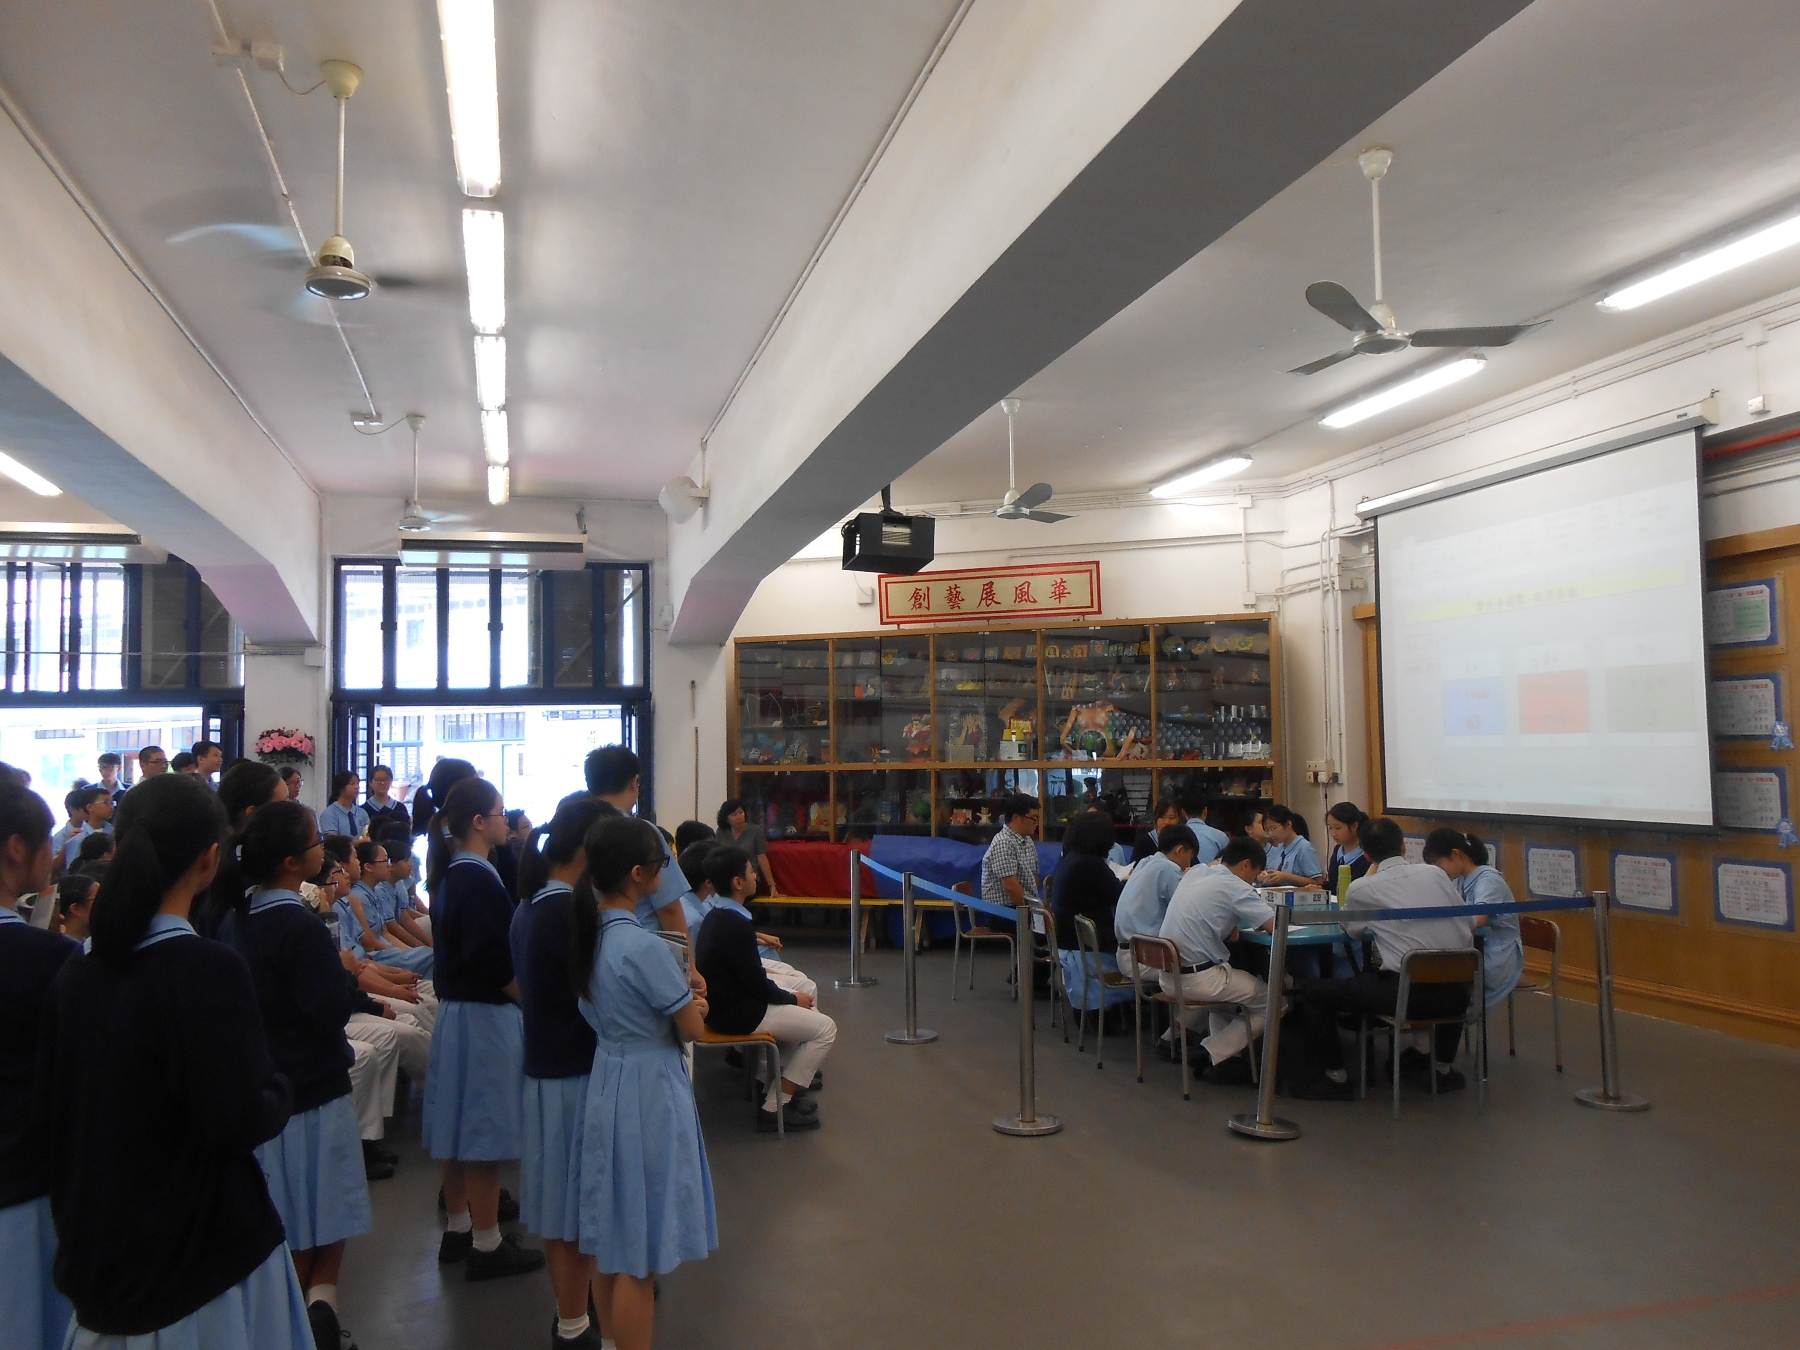 http://npc.edu.hk/sites/default/files/dscn2050.jpg